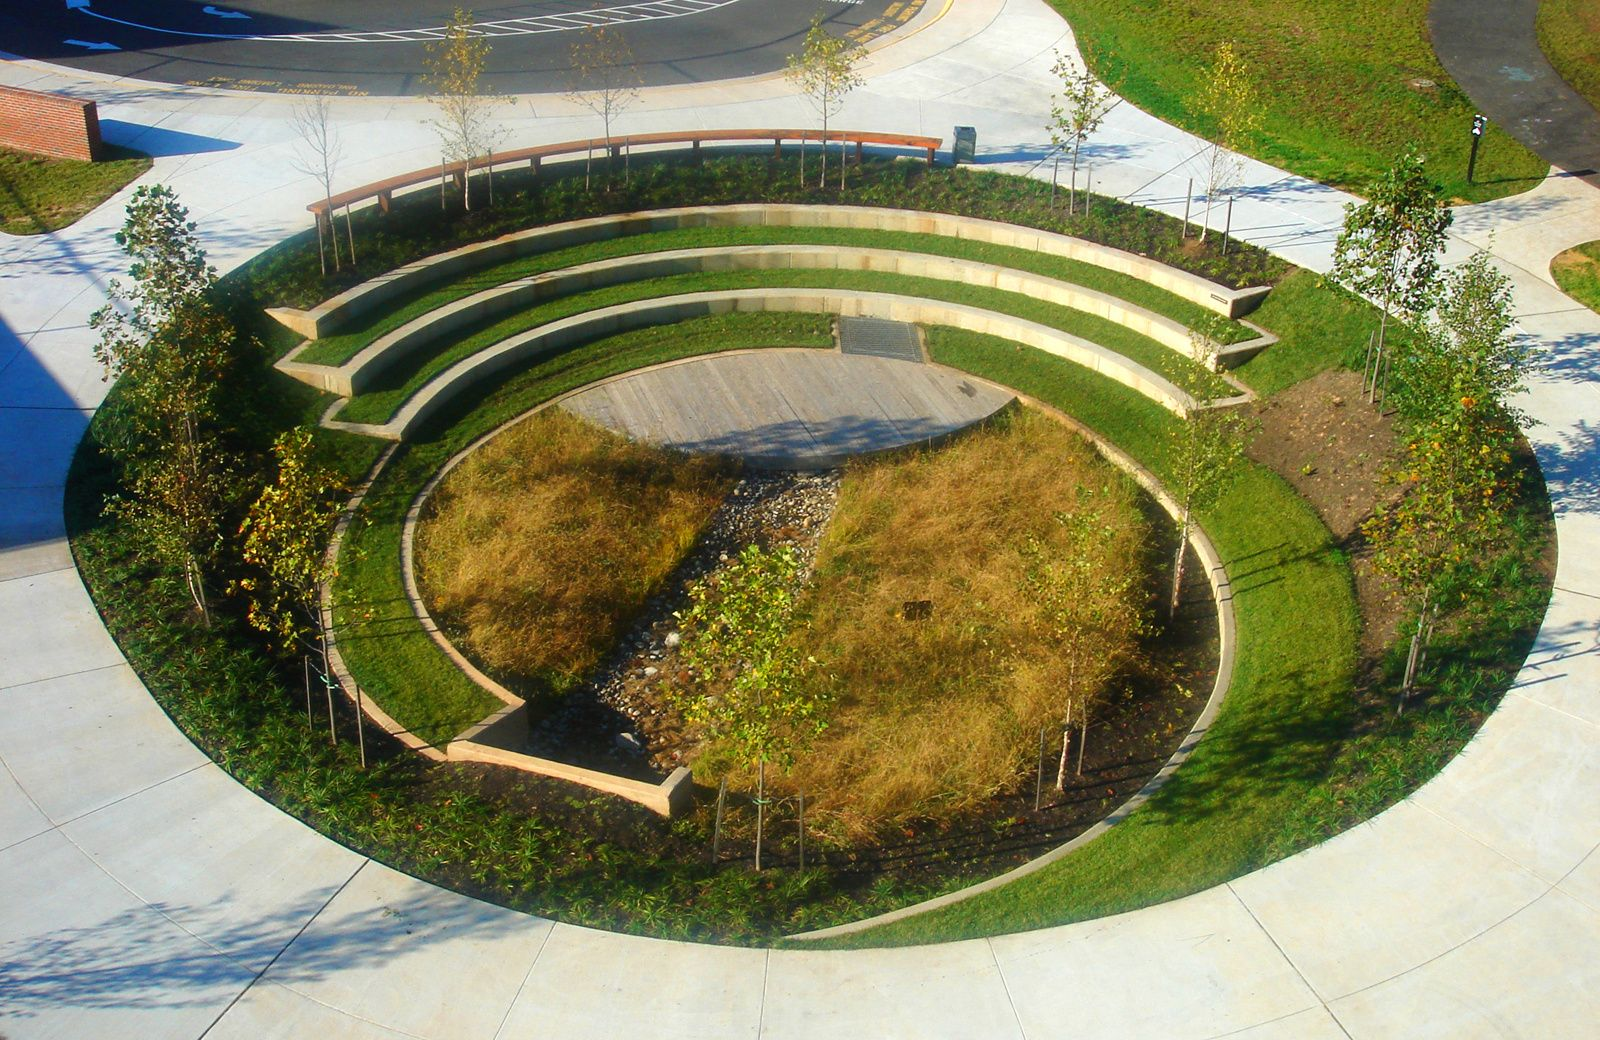 Slideshow Top Ten Green Projects 2010 Dwell Landscape Architecture Landscape Architecture Design Landscape Design